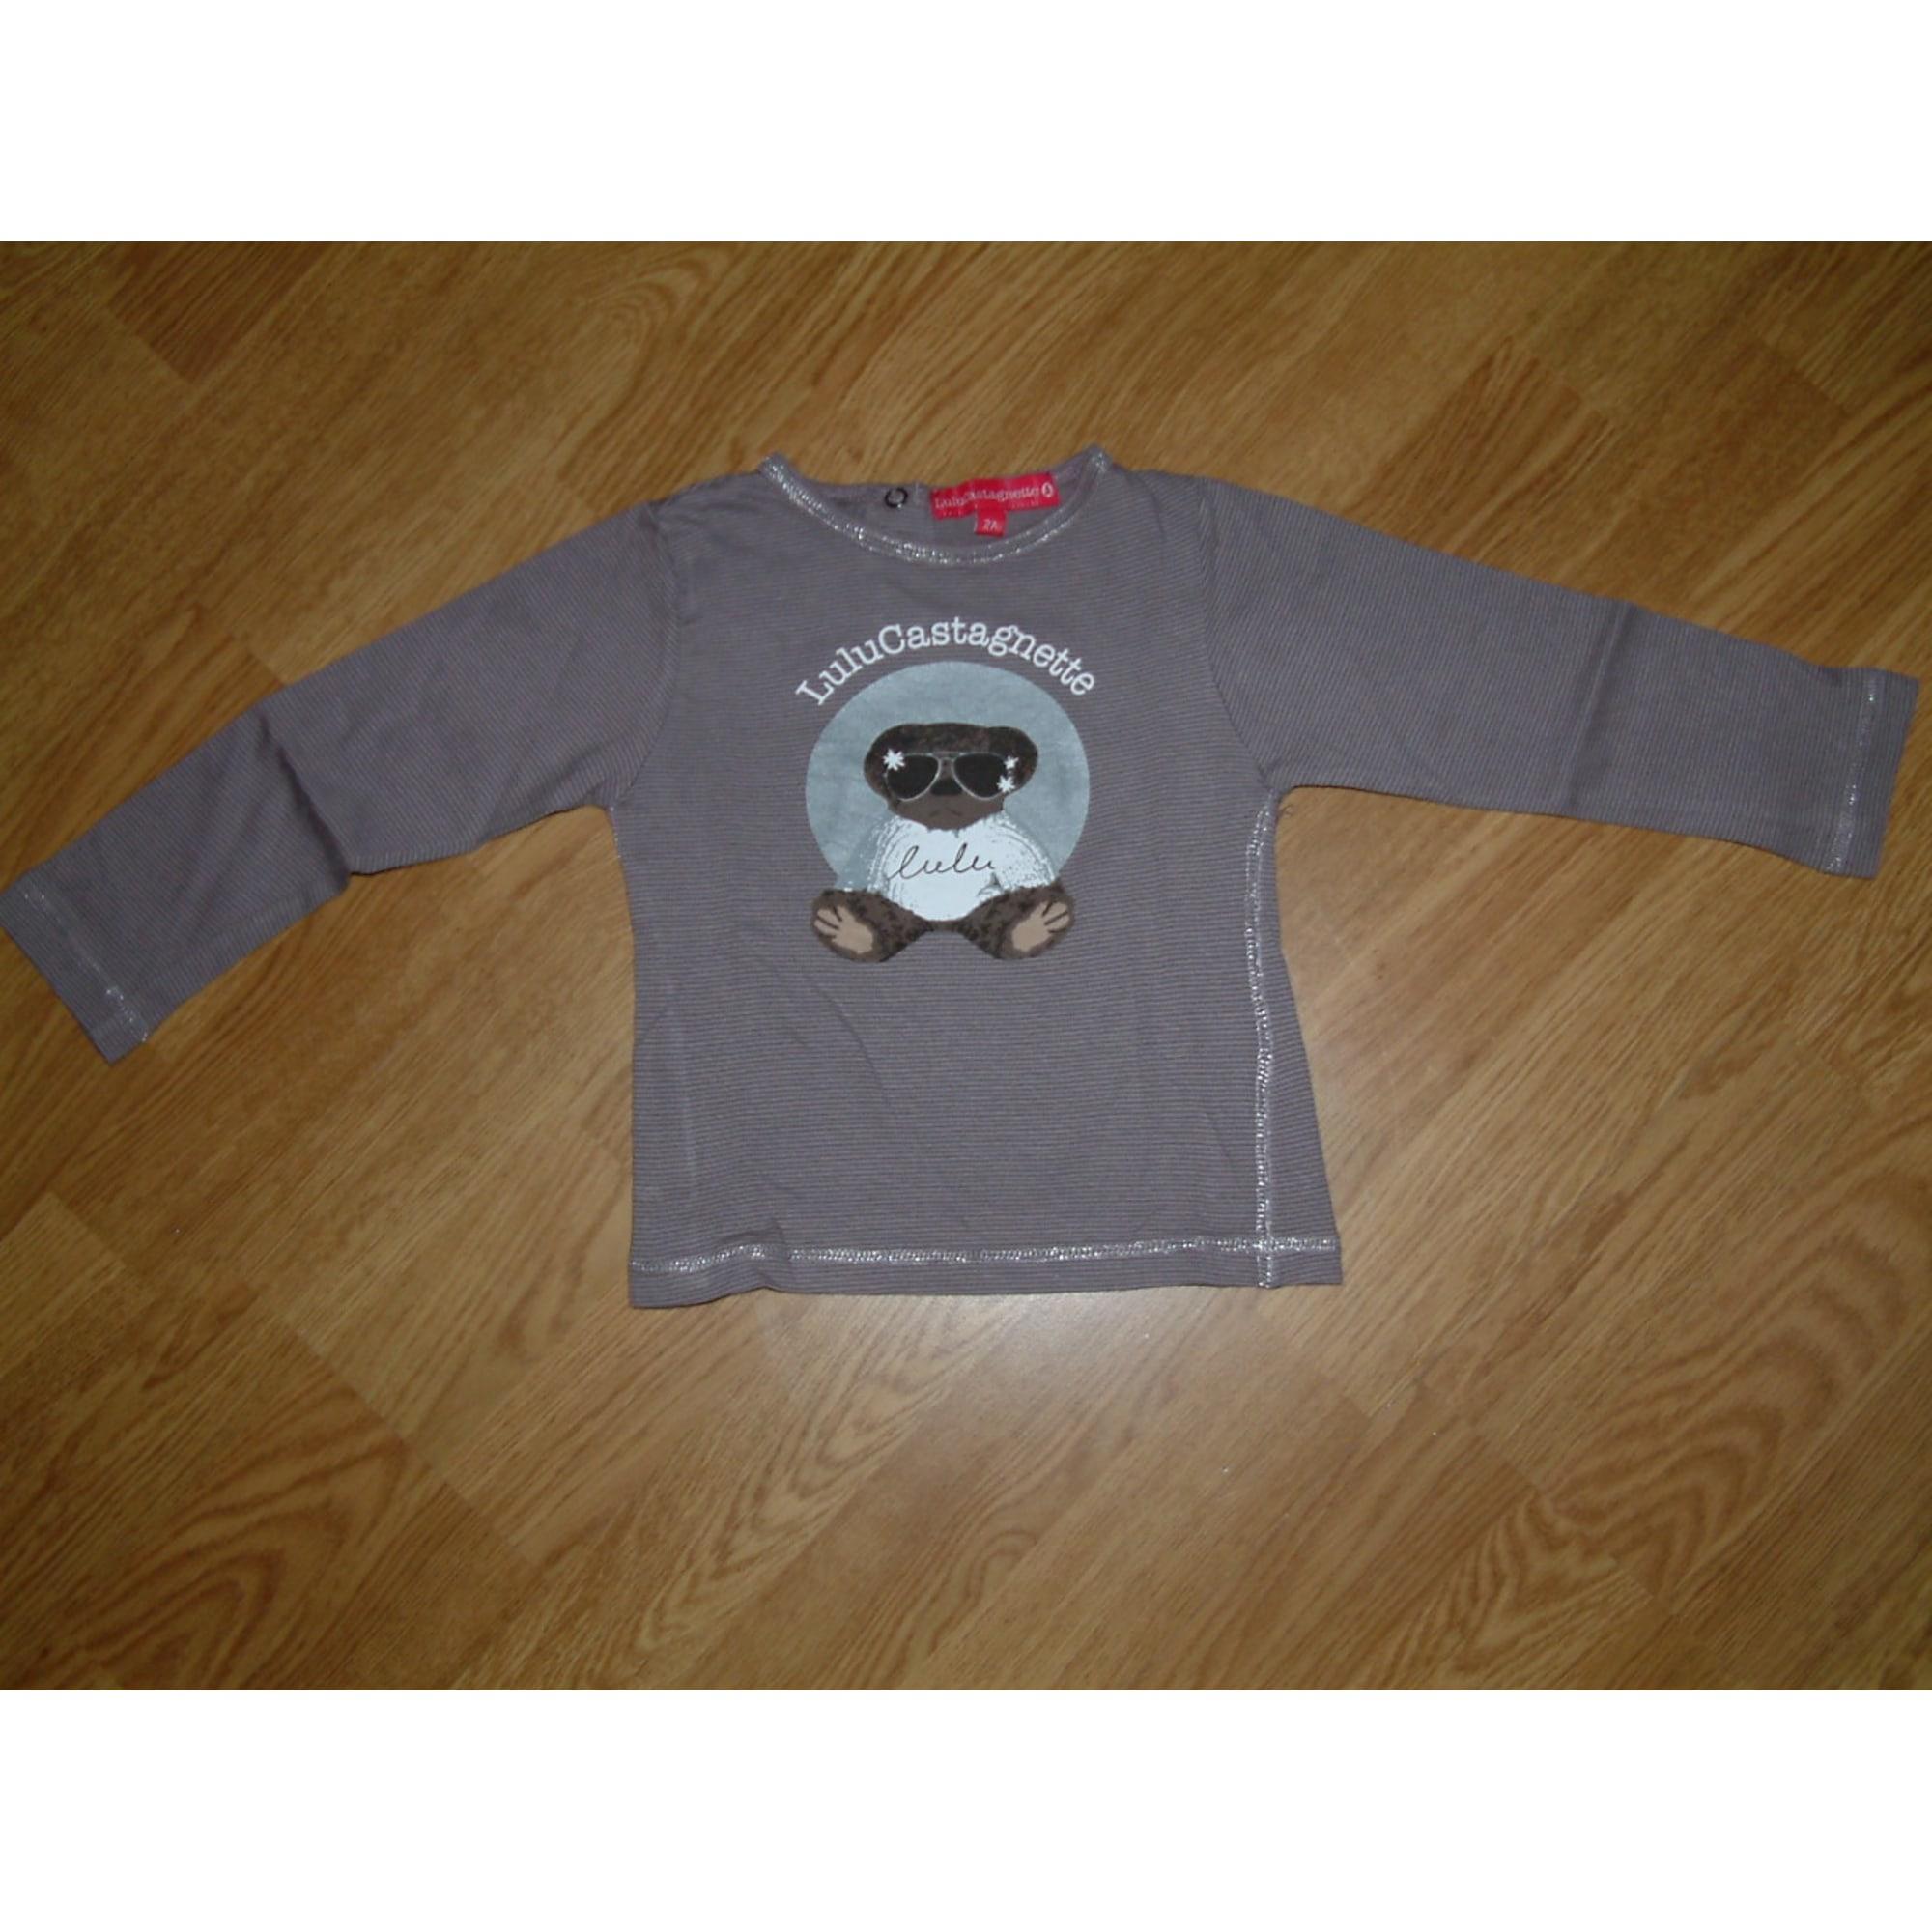 Top, Tee-shirt LULU CASTAGNETTE Violet, mauve, lavande